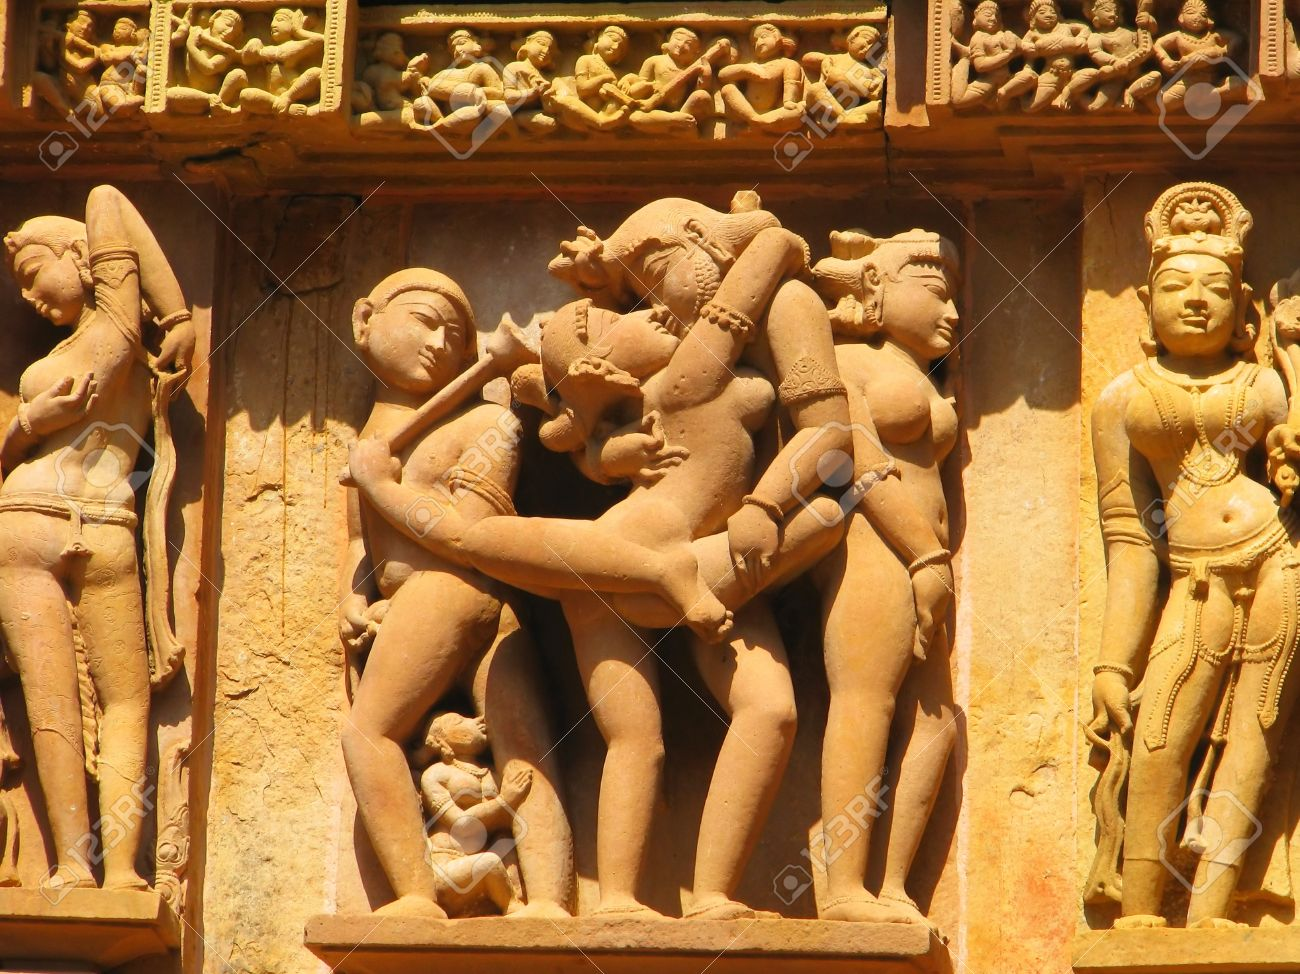 Stone carved erotic sculptures in Hindu temple in Khajuraho, Madhya Pradesh, India Stock Photo - 13060847